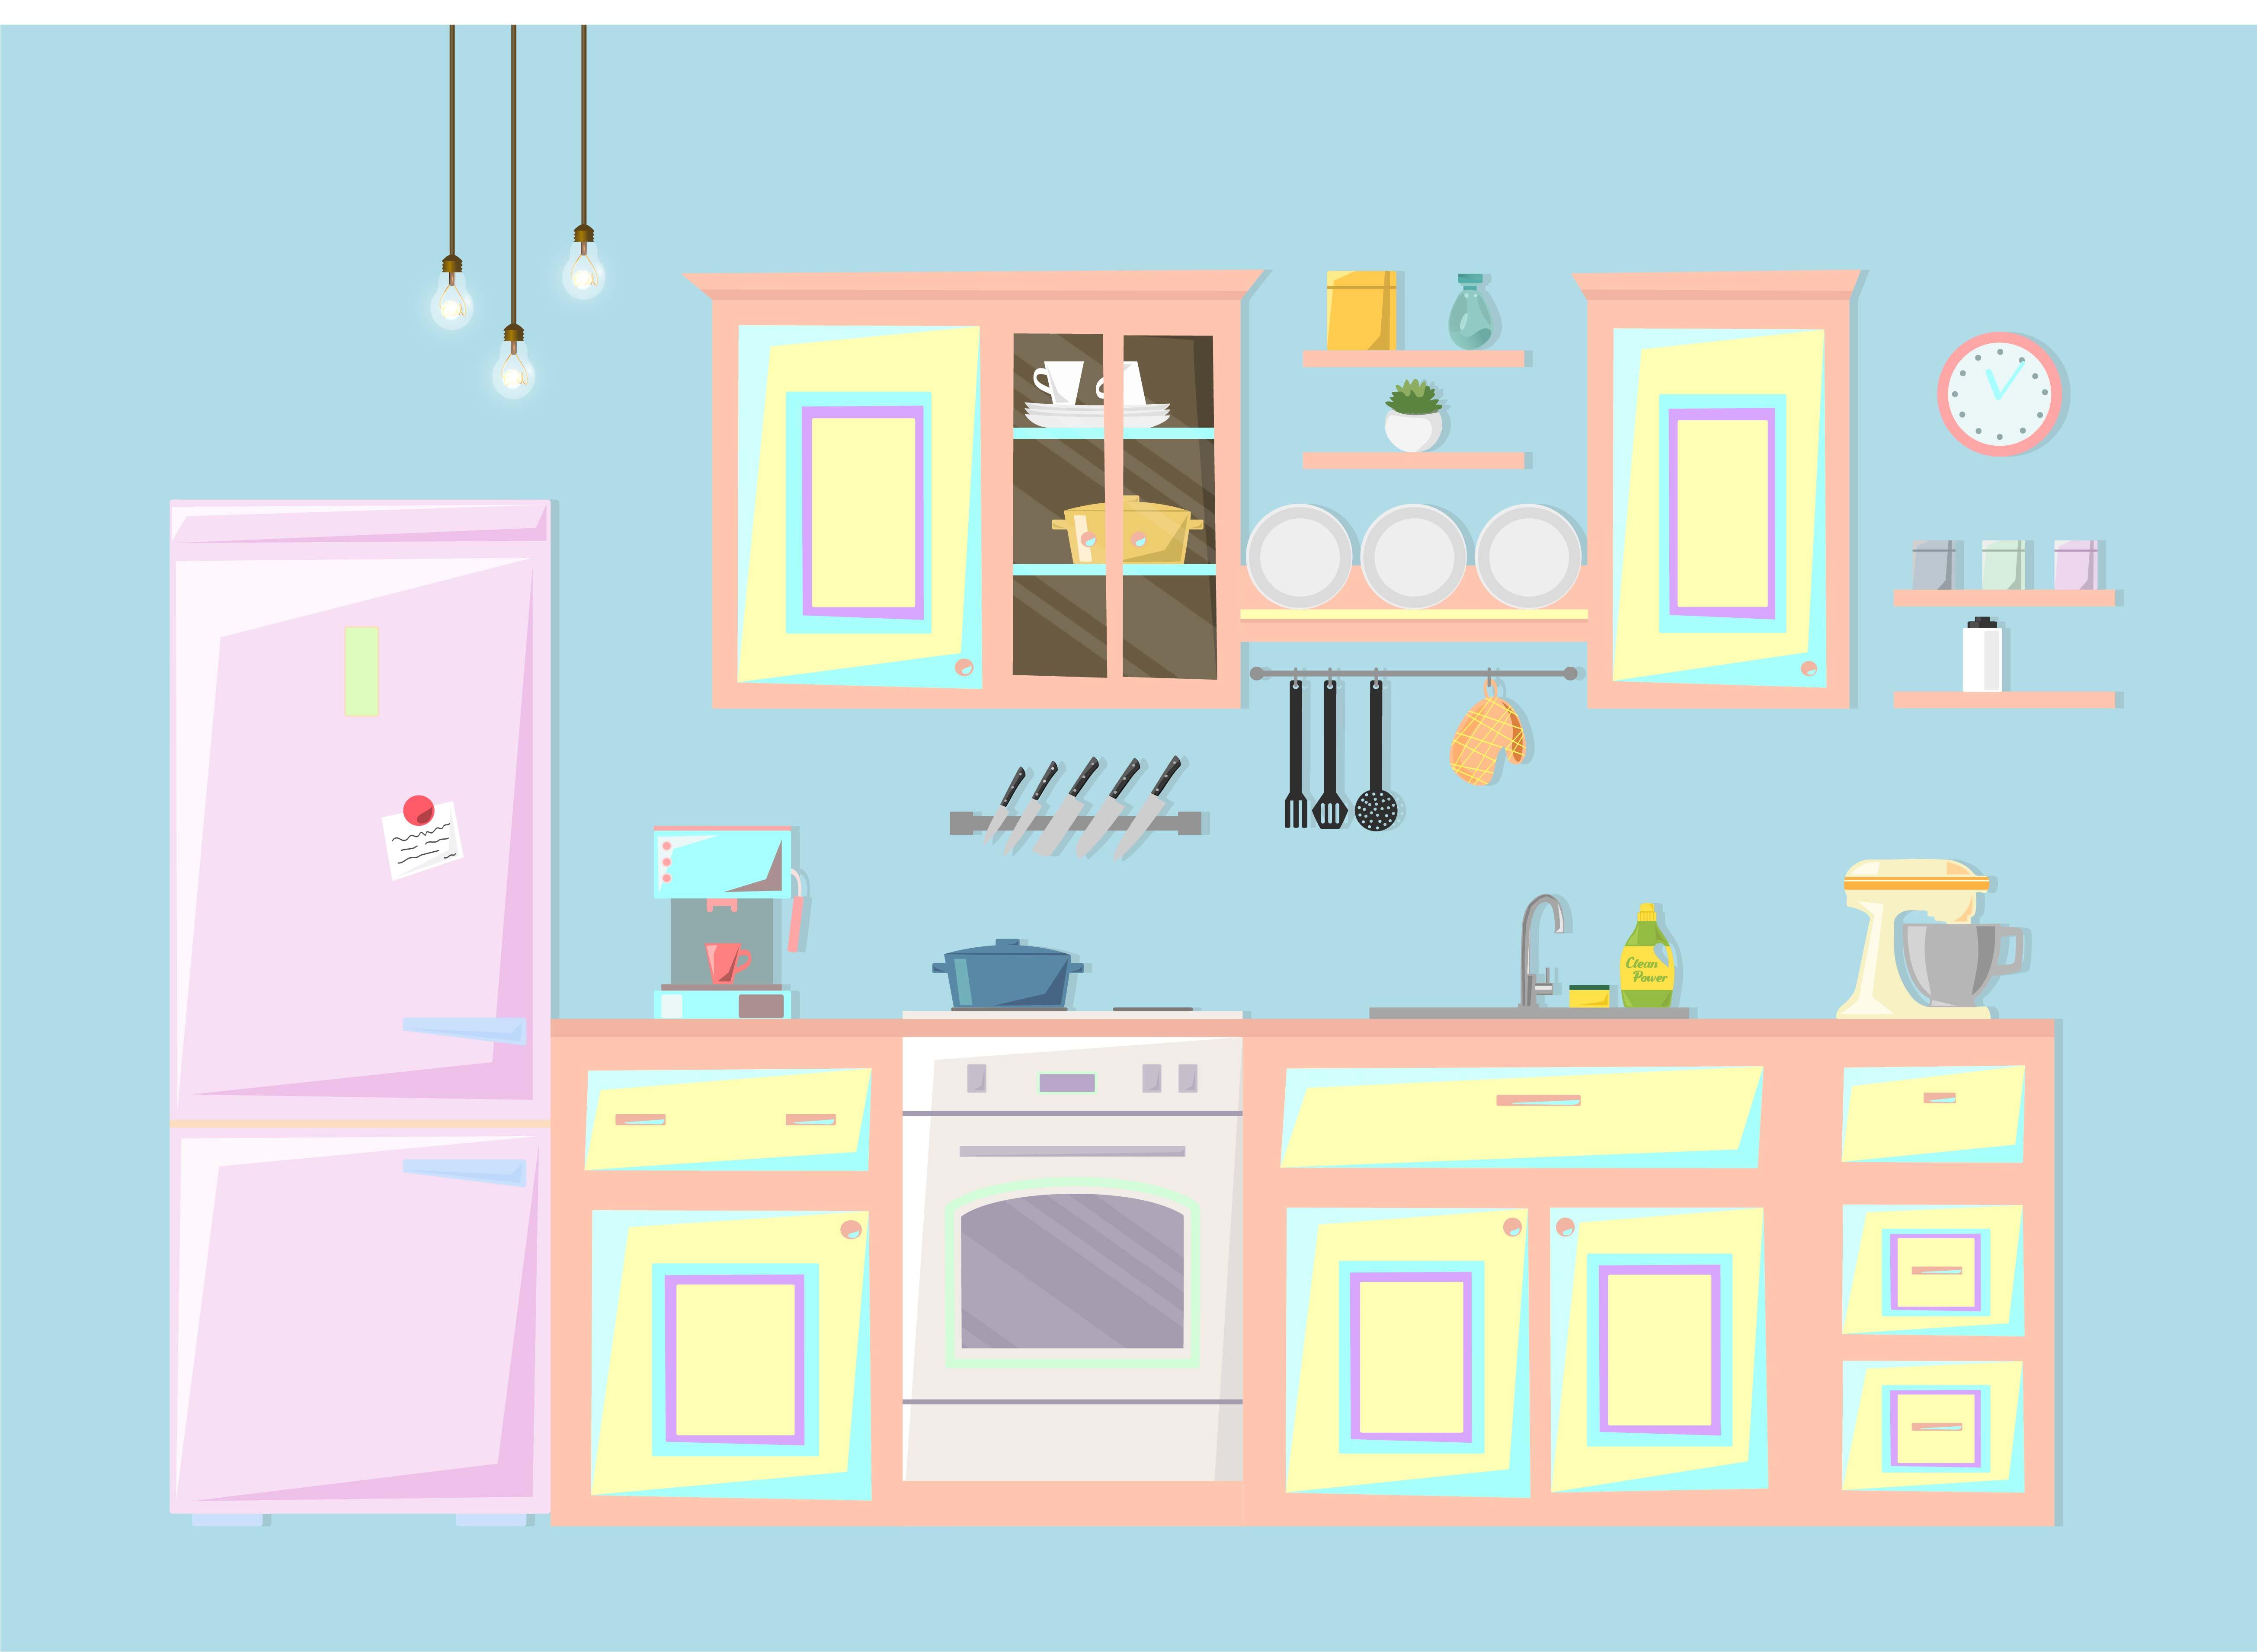 Kitchen Interior Vector Illustration Download Free